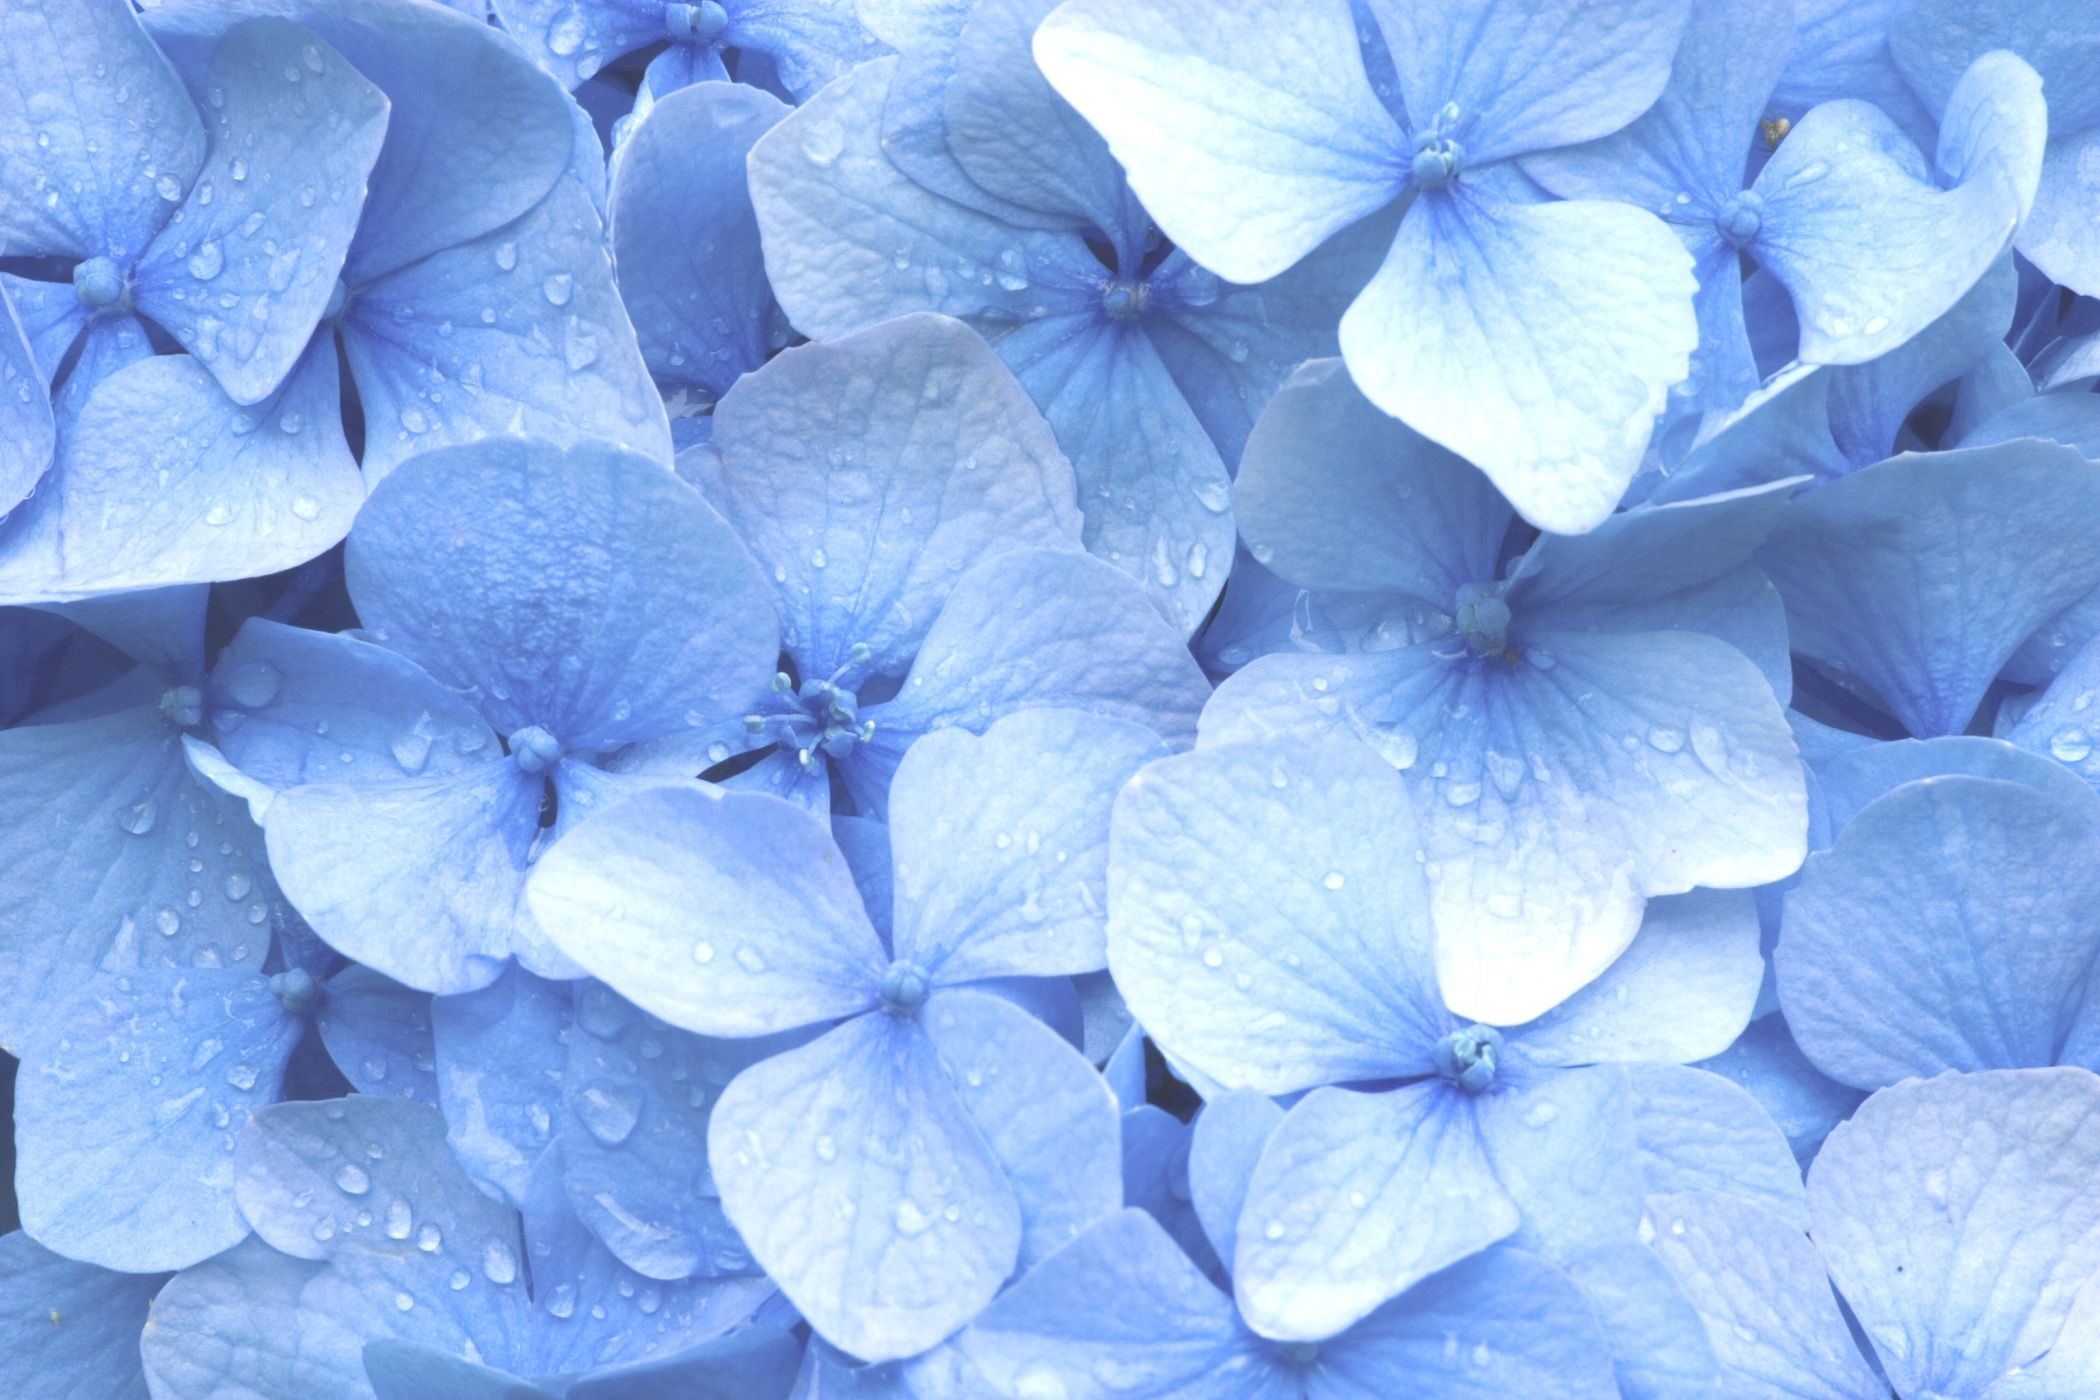 Blue Hydrangea Wallpaper Wallpapersafari Hydrangea Wallpaper Hydrangea Blue Hydrangea